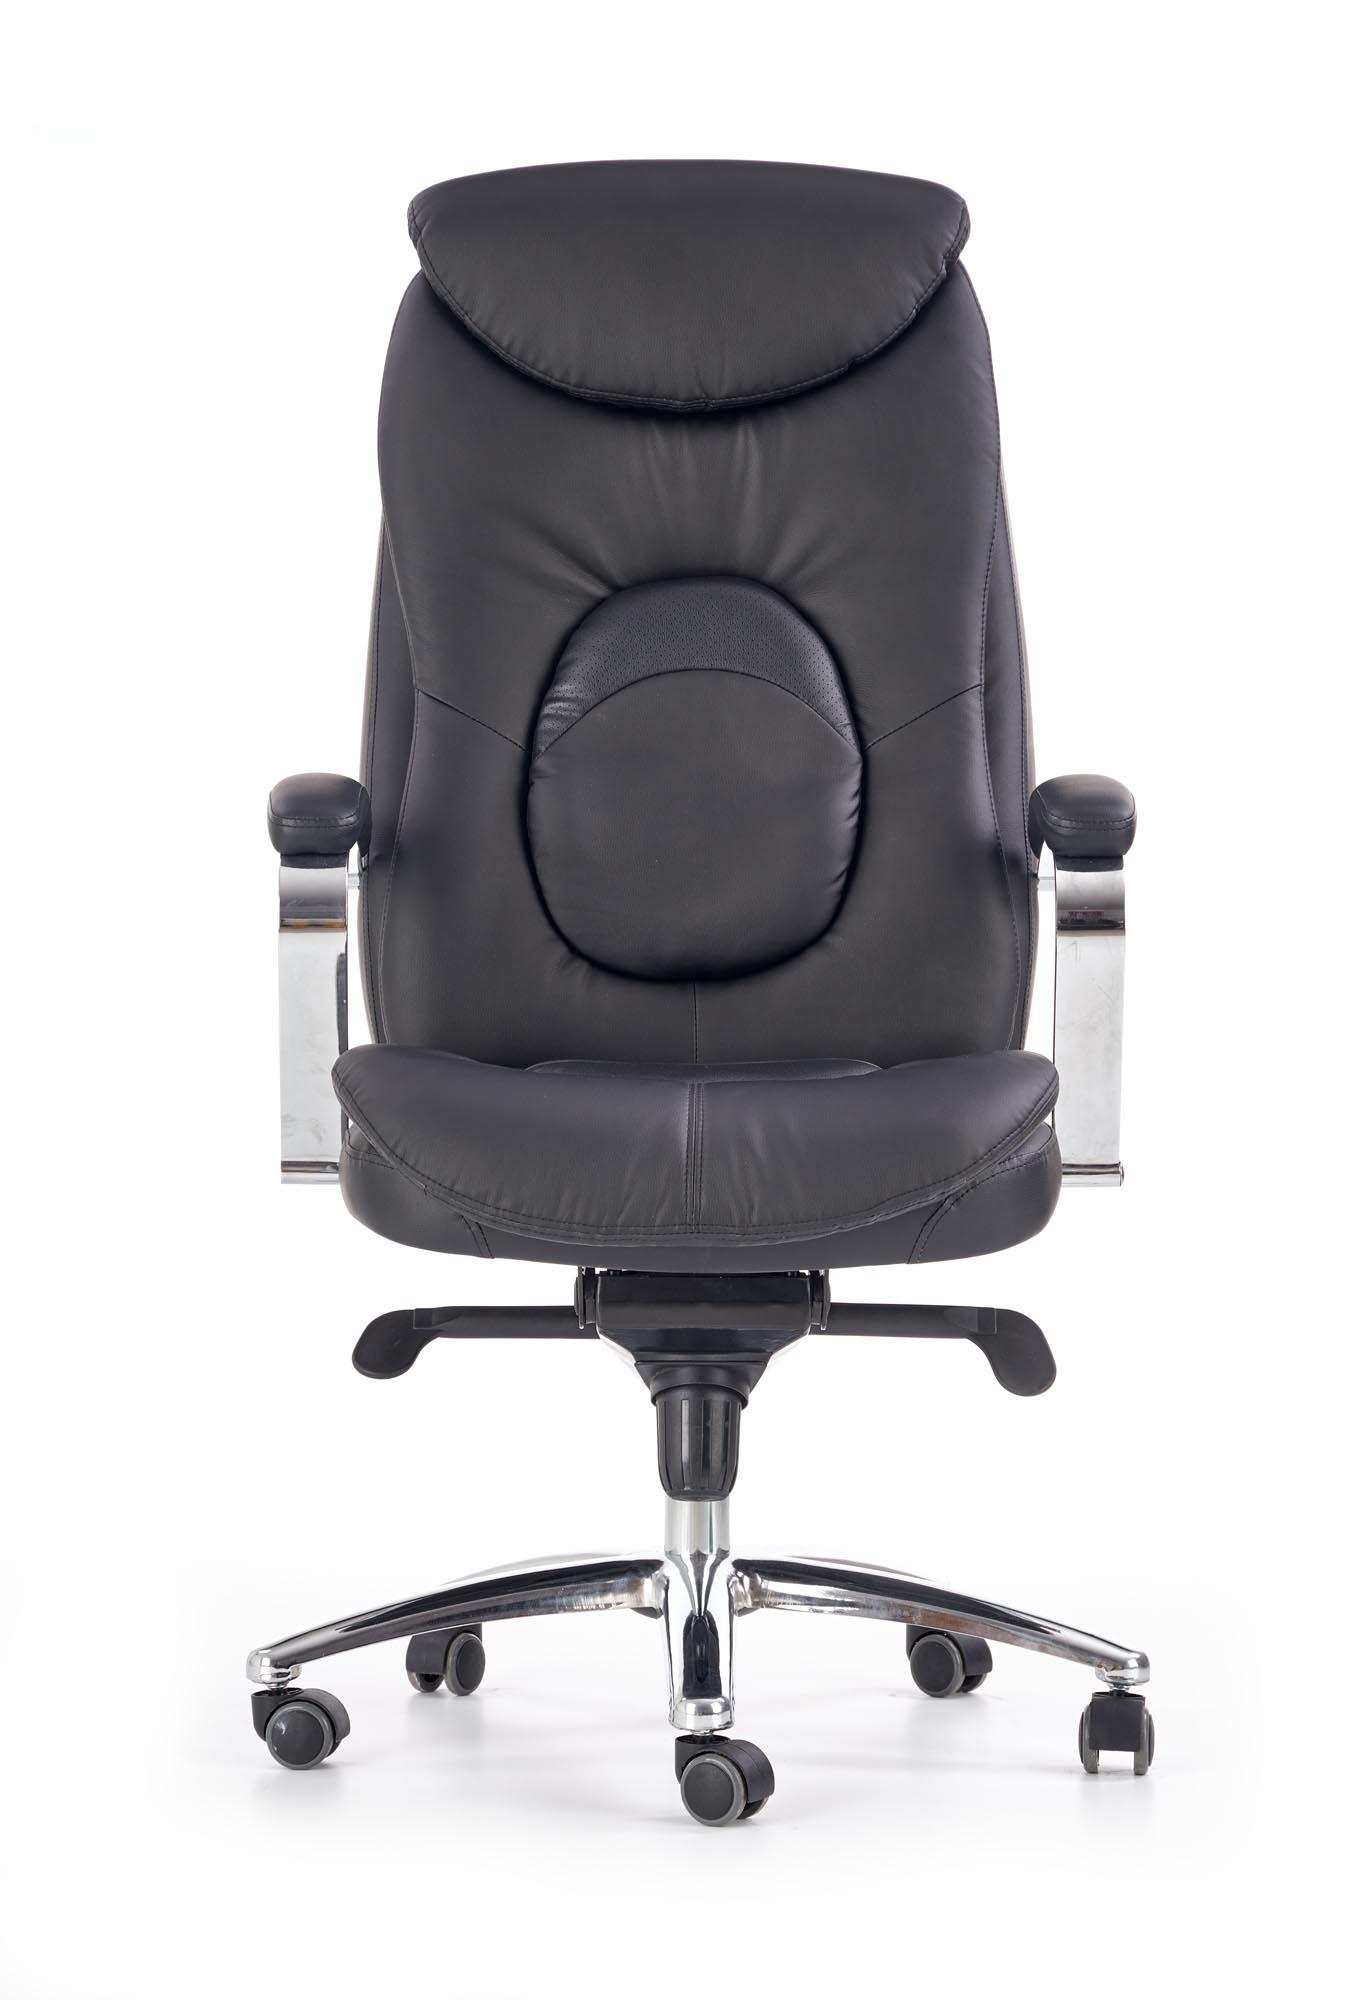 Scaun de birou directorial tapitat cu piele ecologica Quad Black, l63xA70xH124-132 cm poza